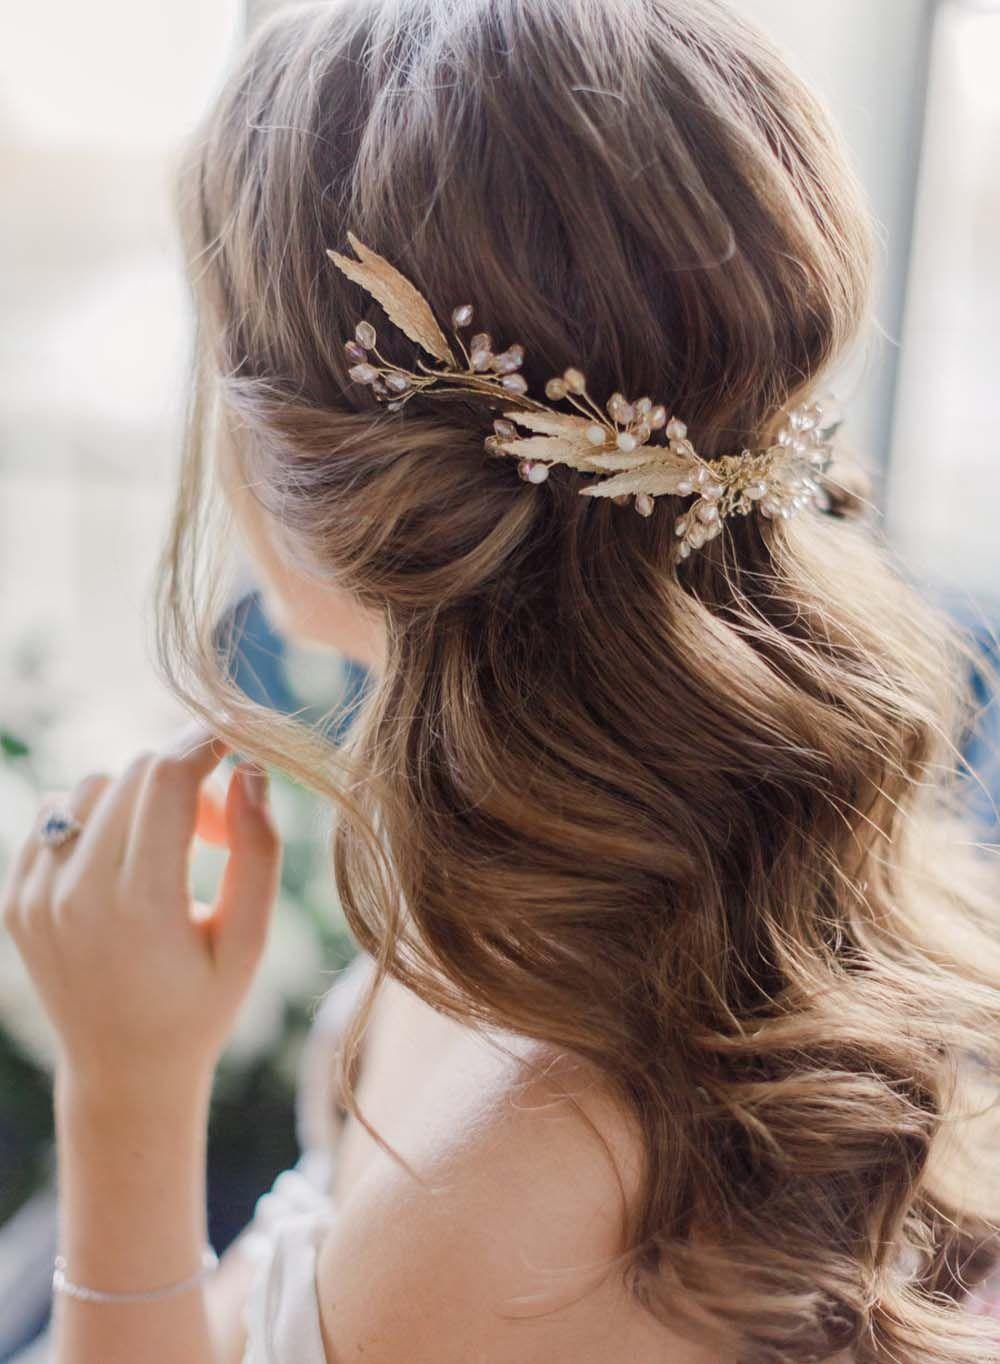 Bridal hair accessories for long hair - A Modern Renaissance Inspired Wedding Shoot